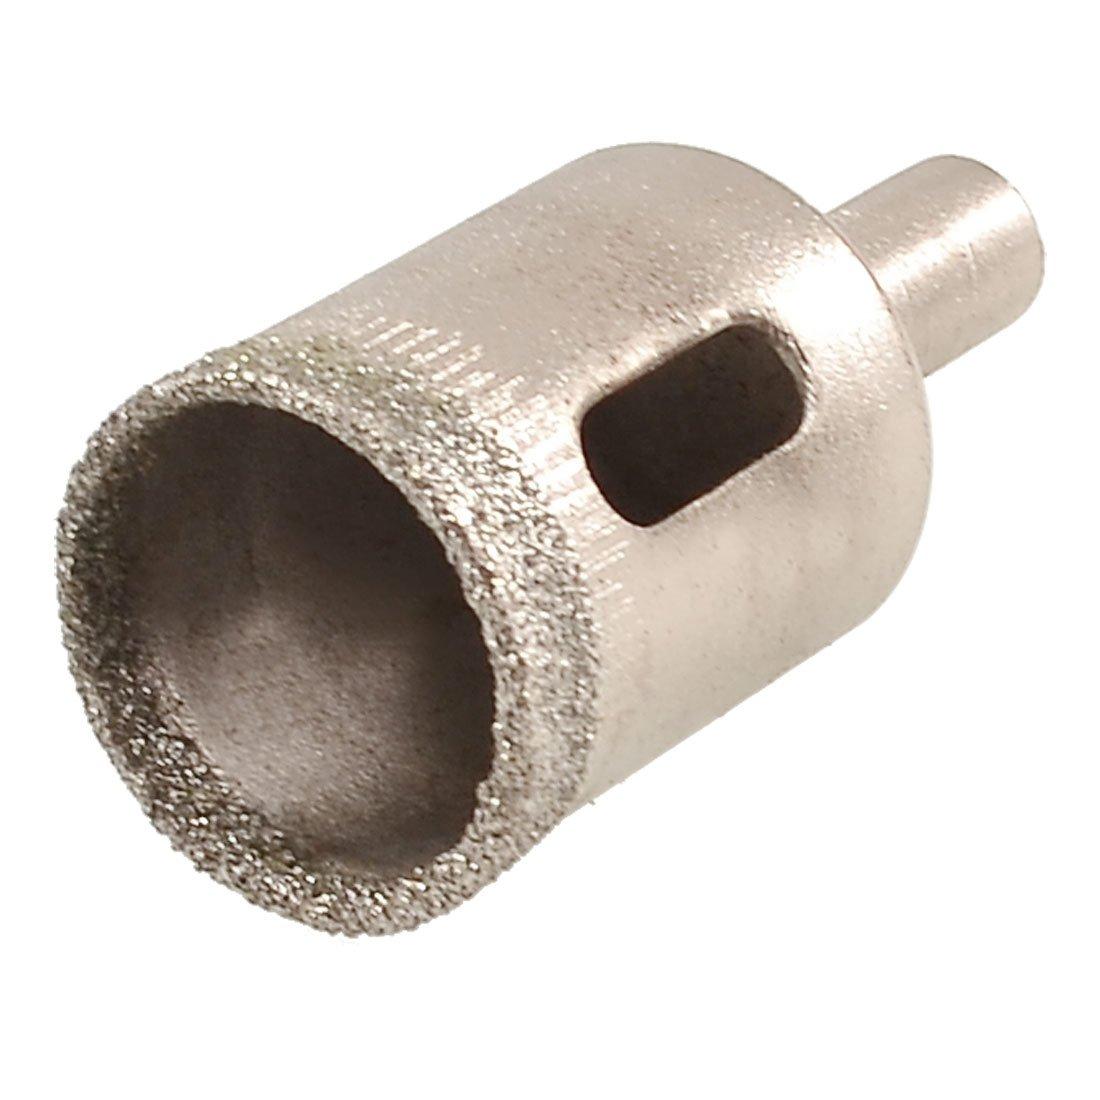 20mm diamond tipped drill bit ceramic tile glass hole saw